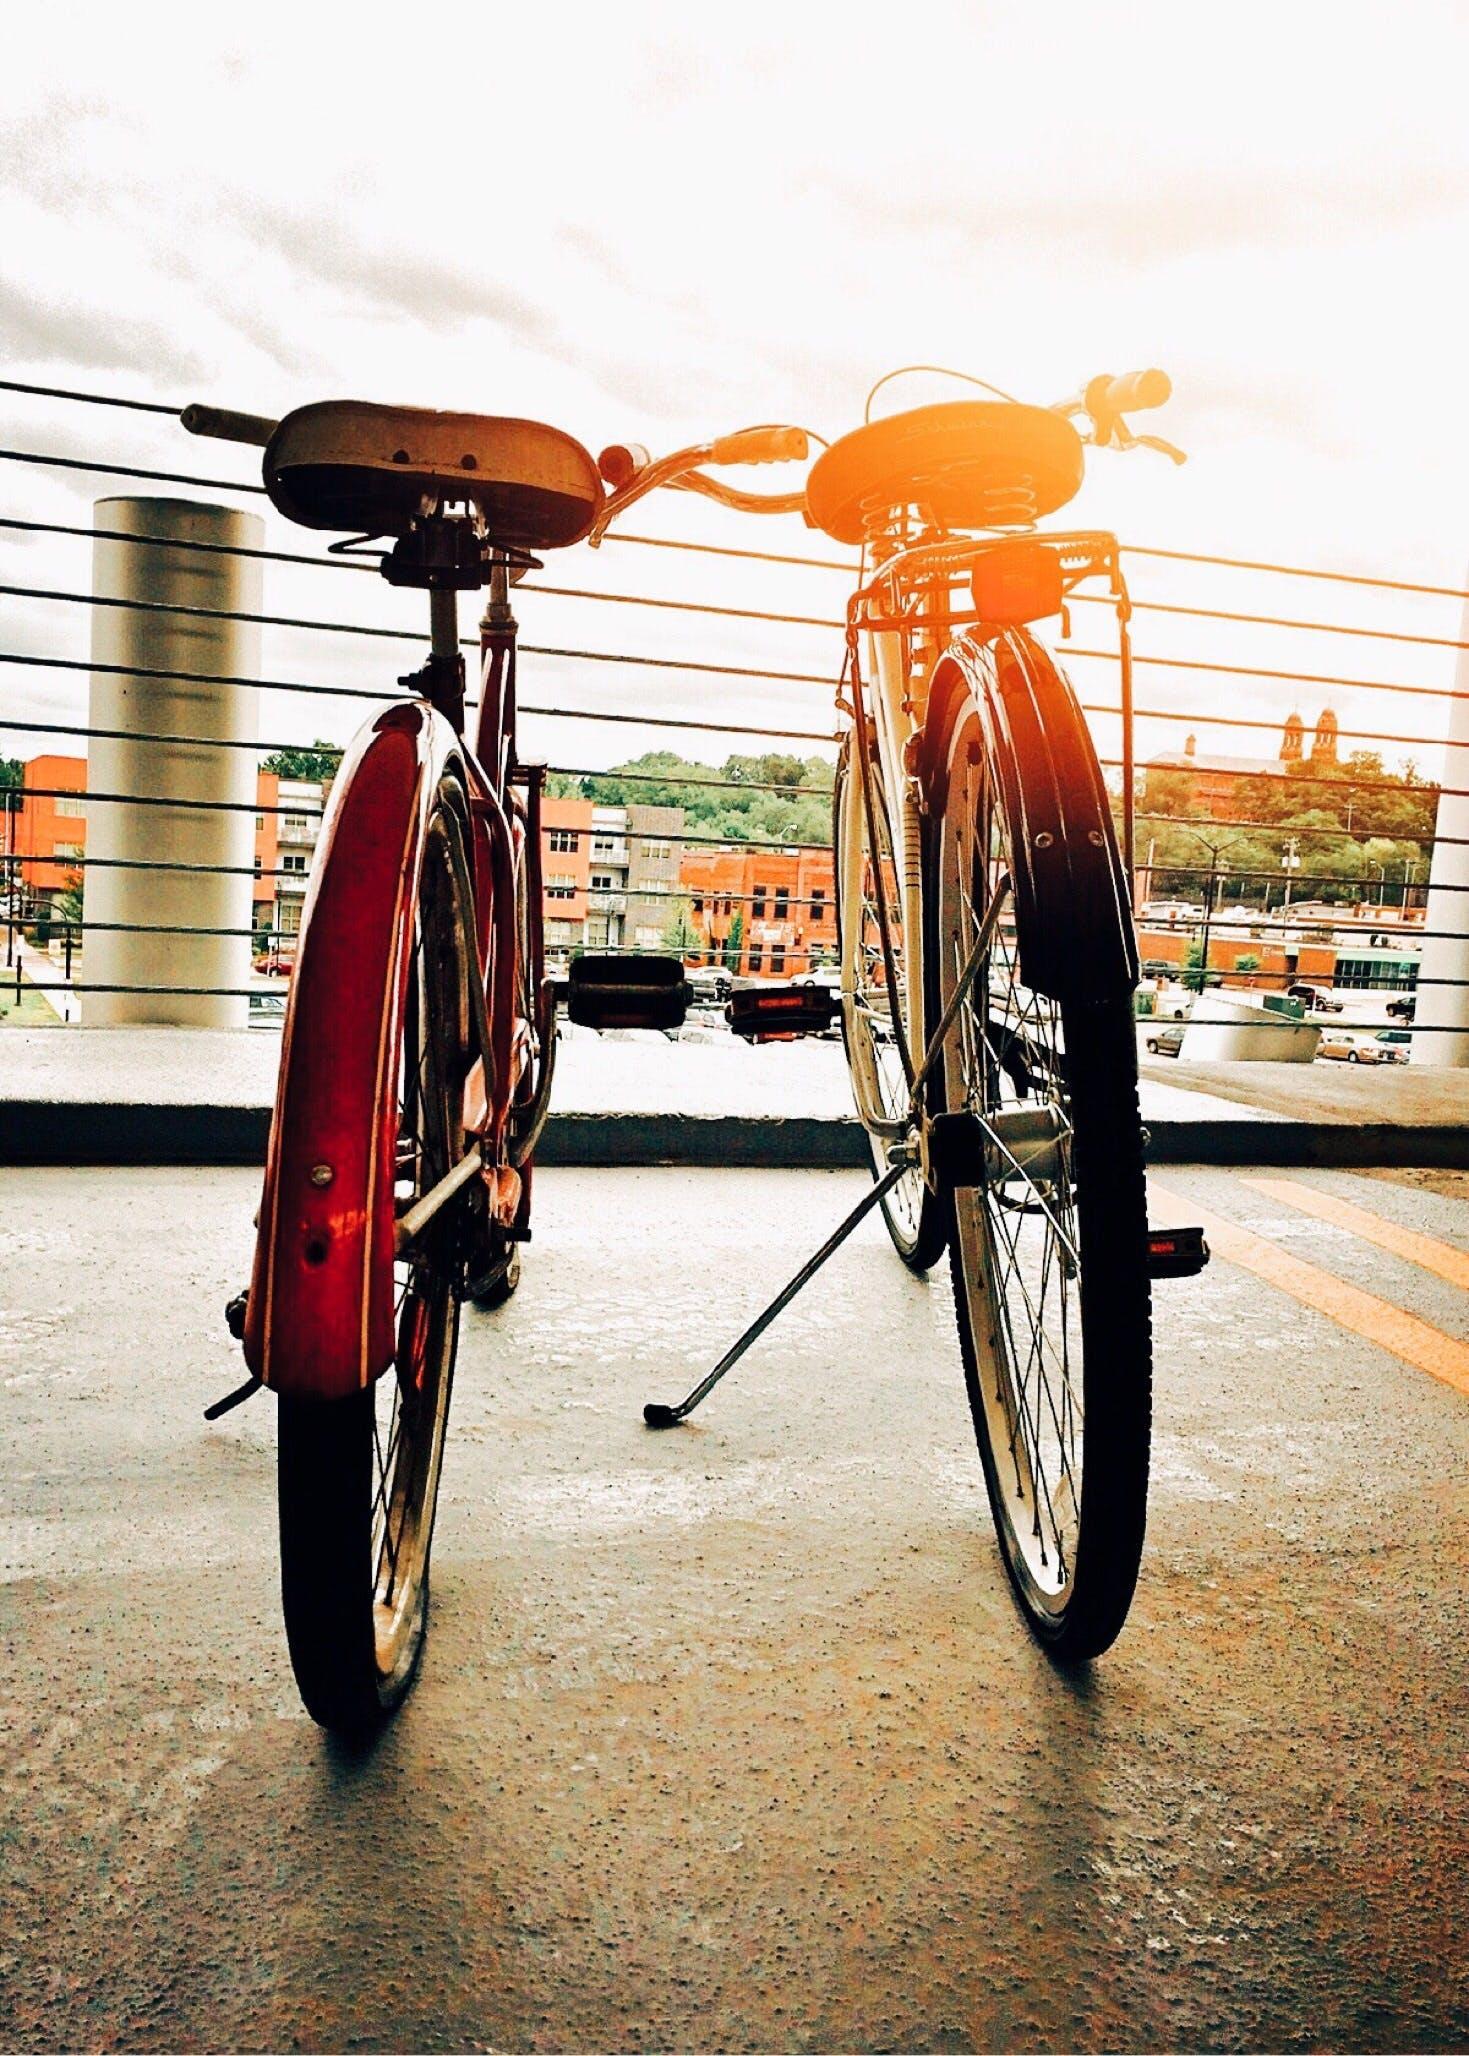 Gratis lagerfoto af by, cykel, cyklist, gade